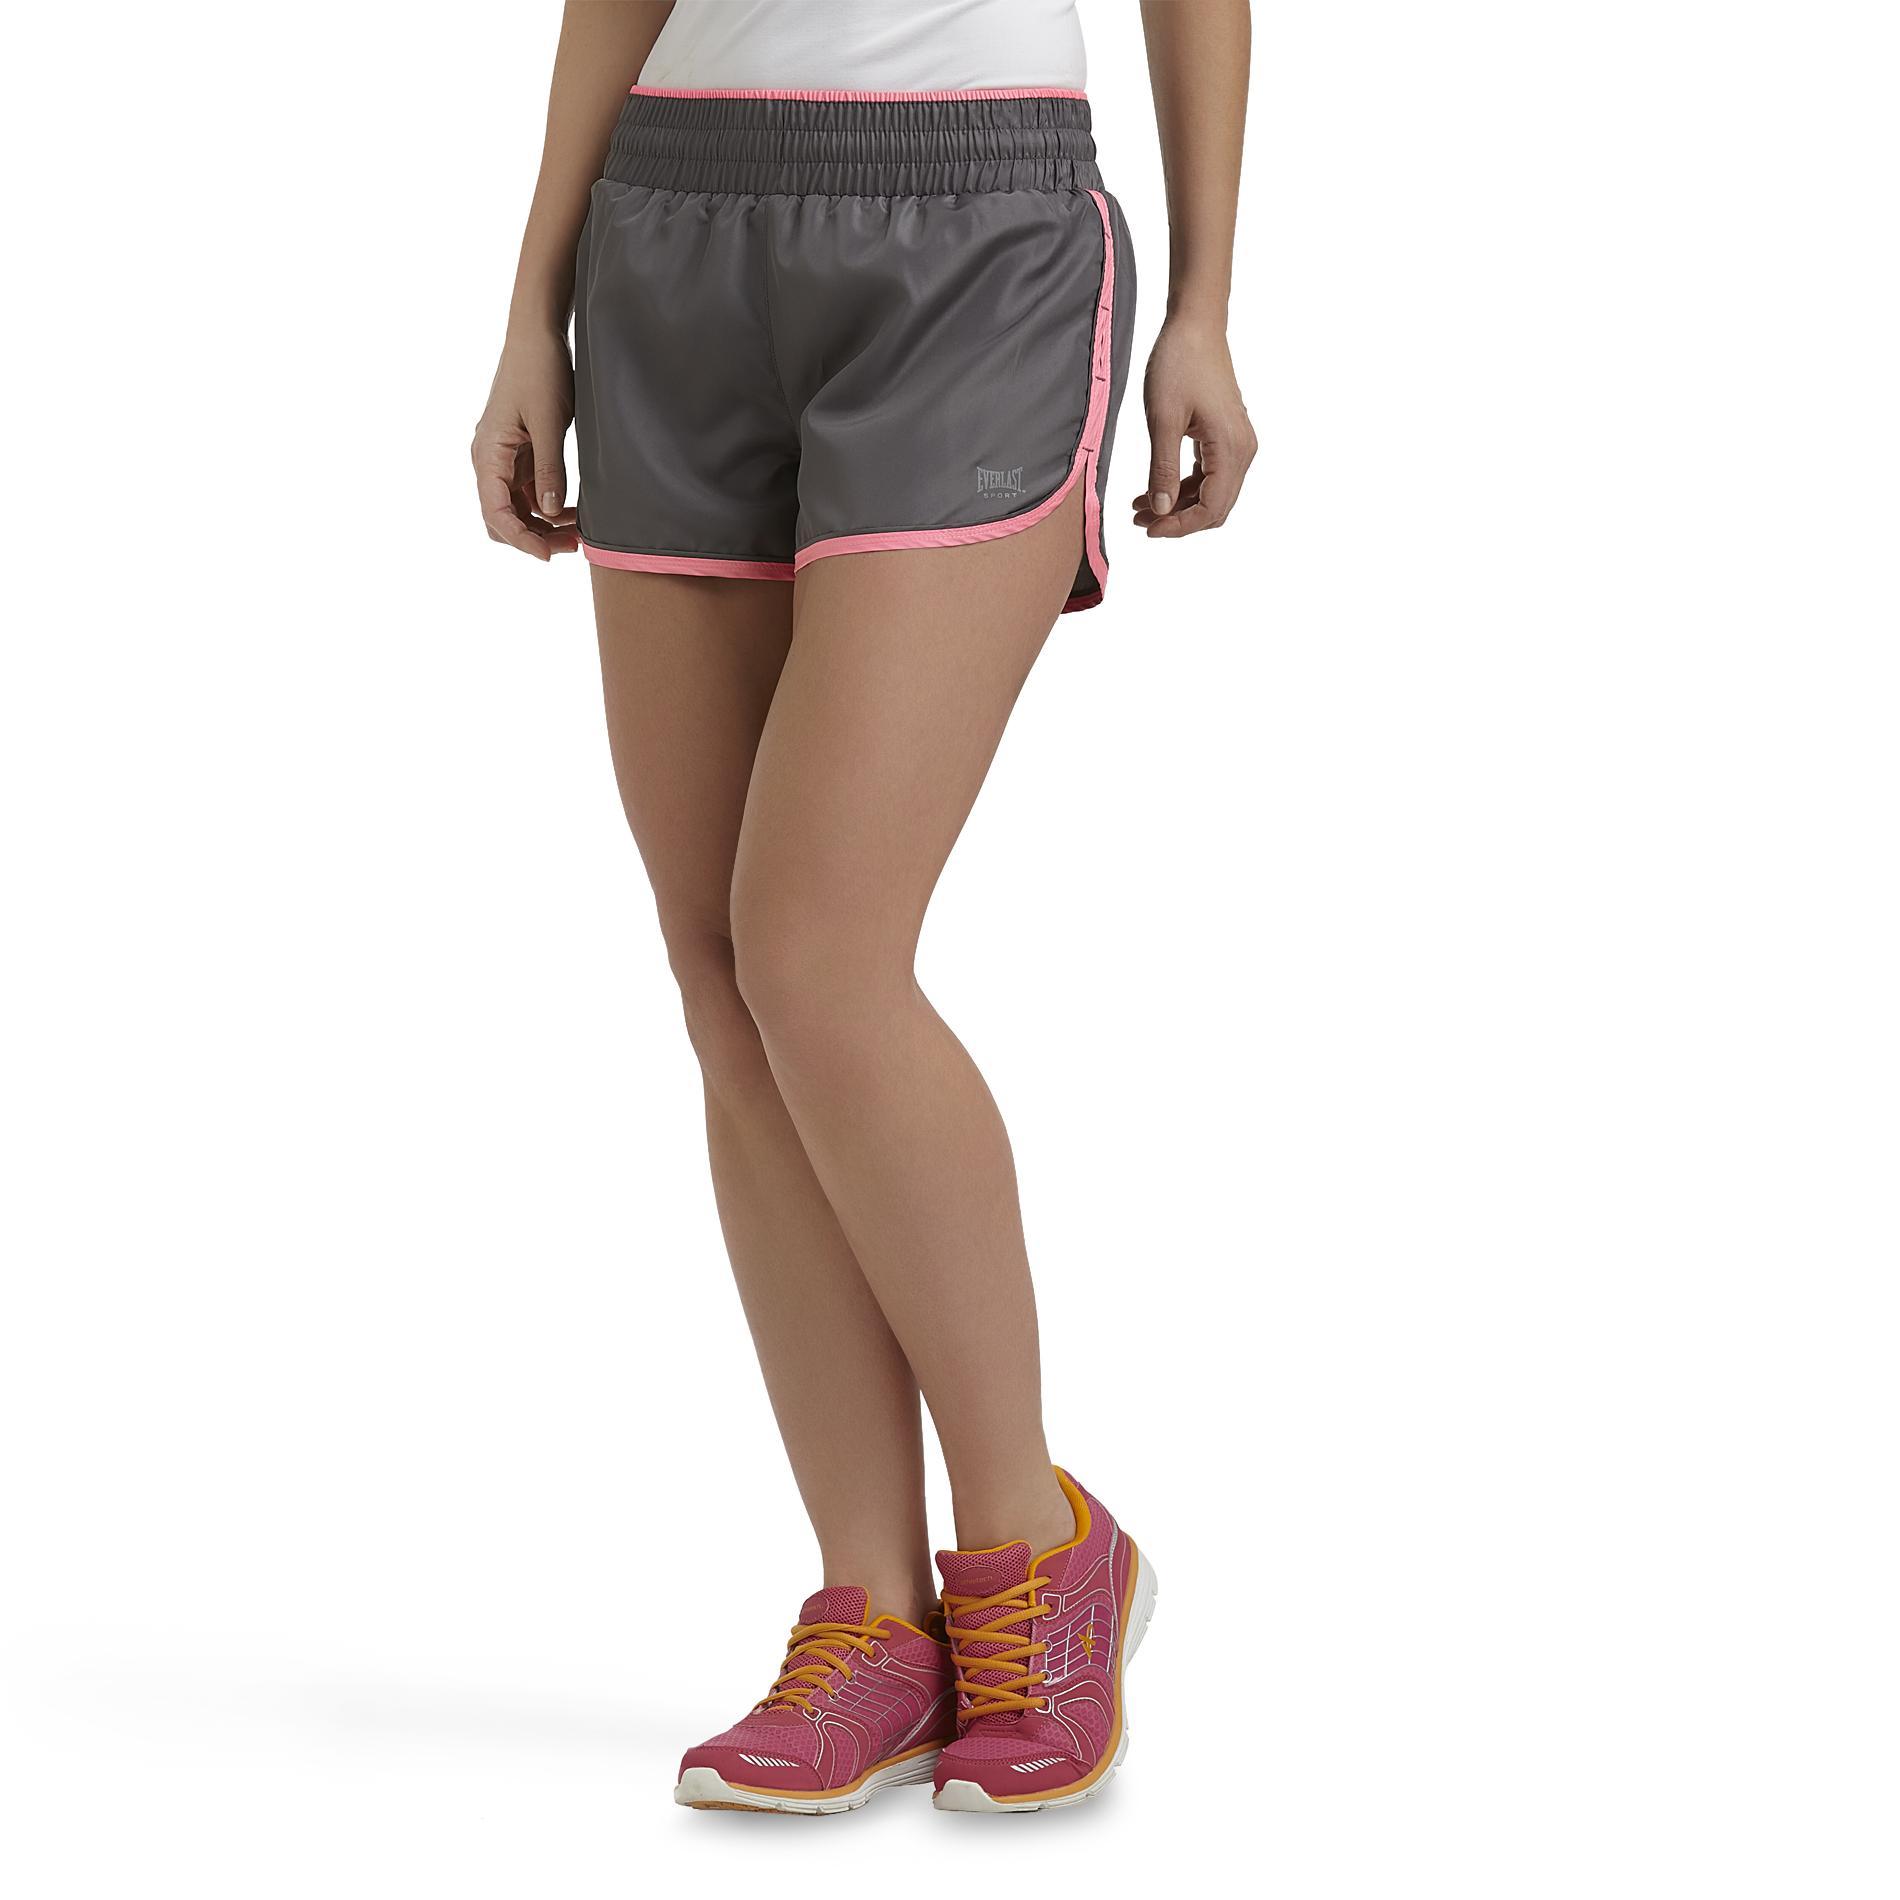 Everlast® Sport Women's Running Shorts at Kmart.com